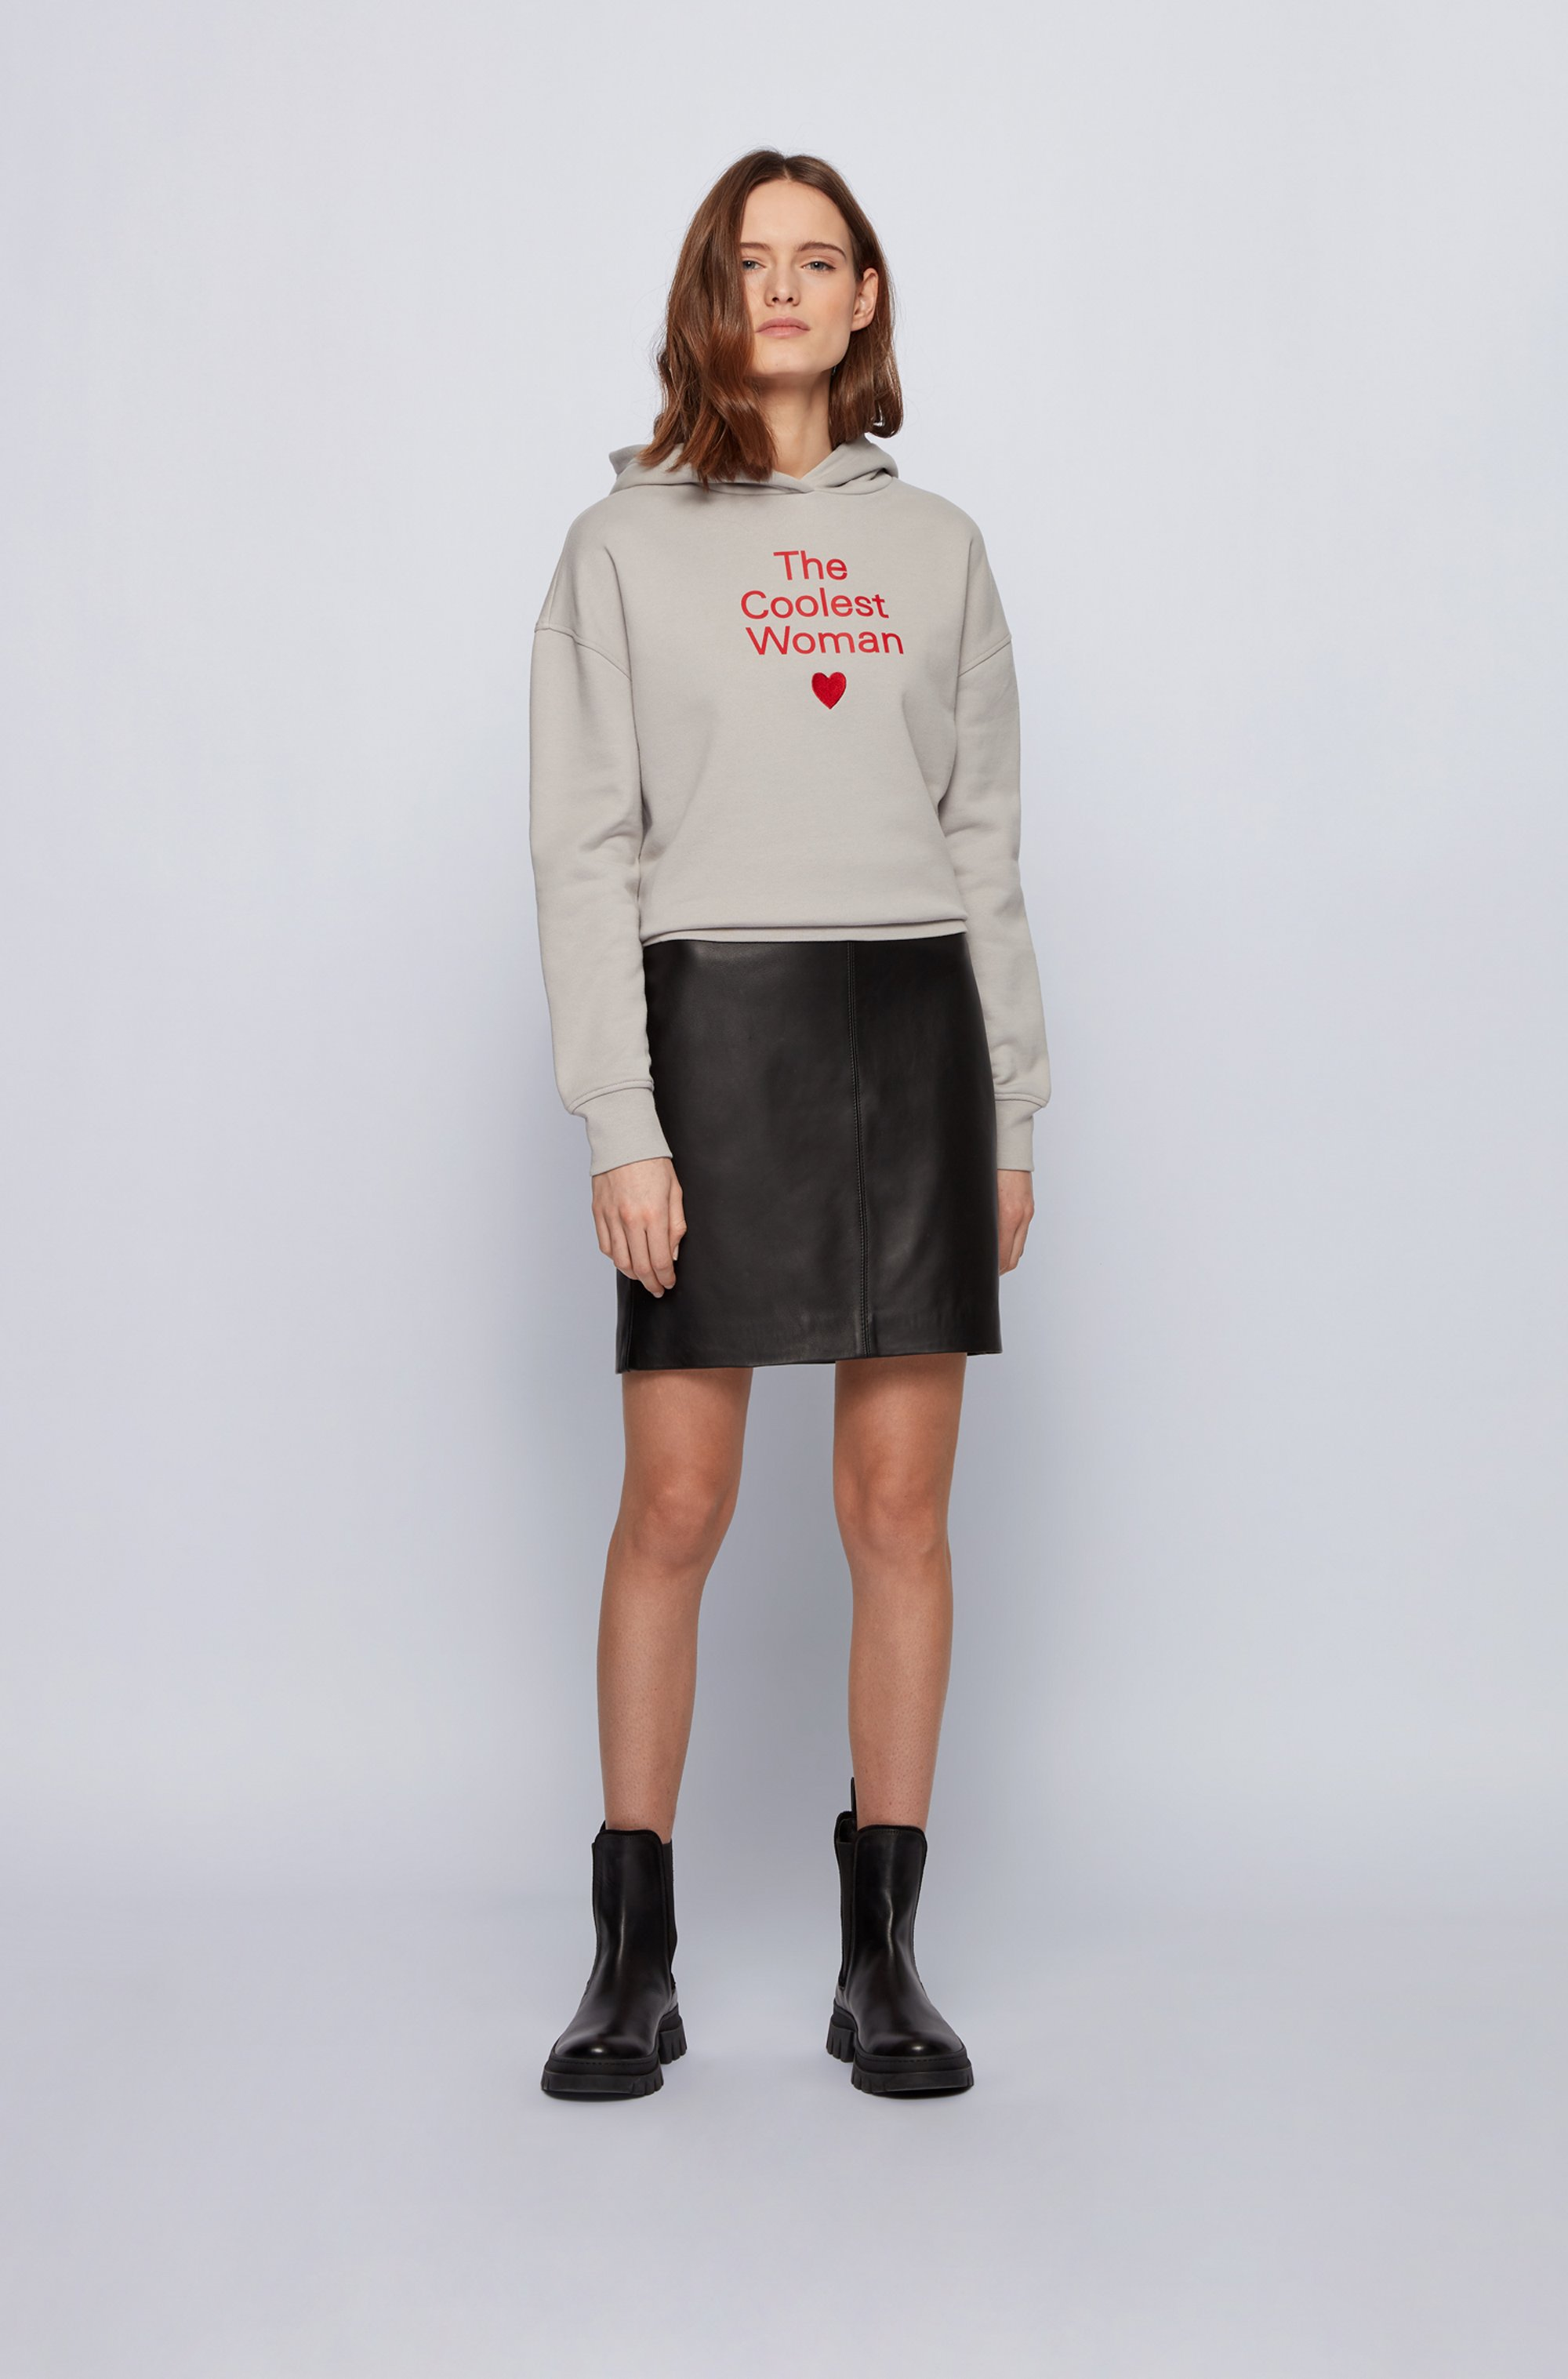 Hooded sweatshirt in organic cotton with printed slogan